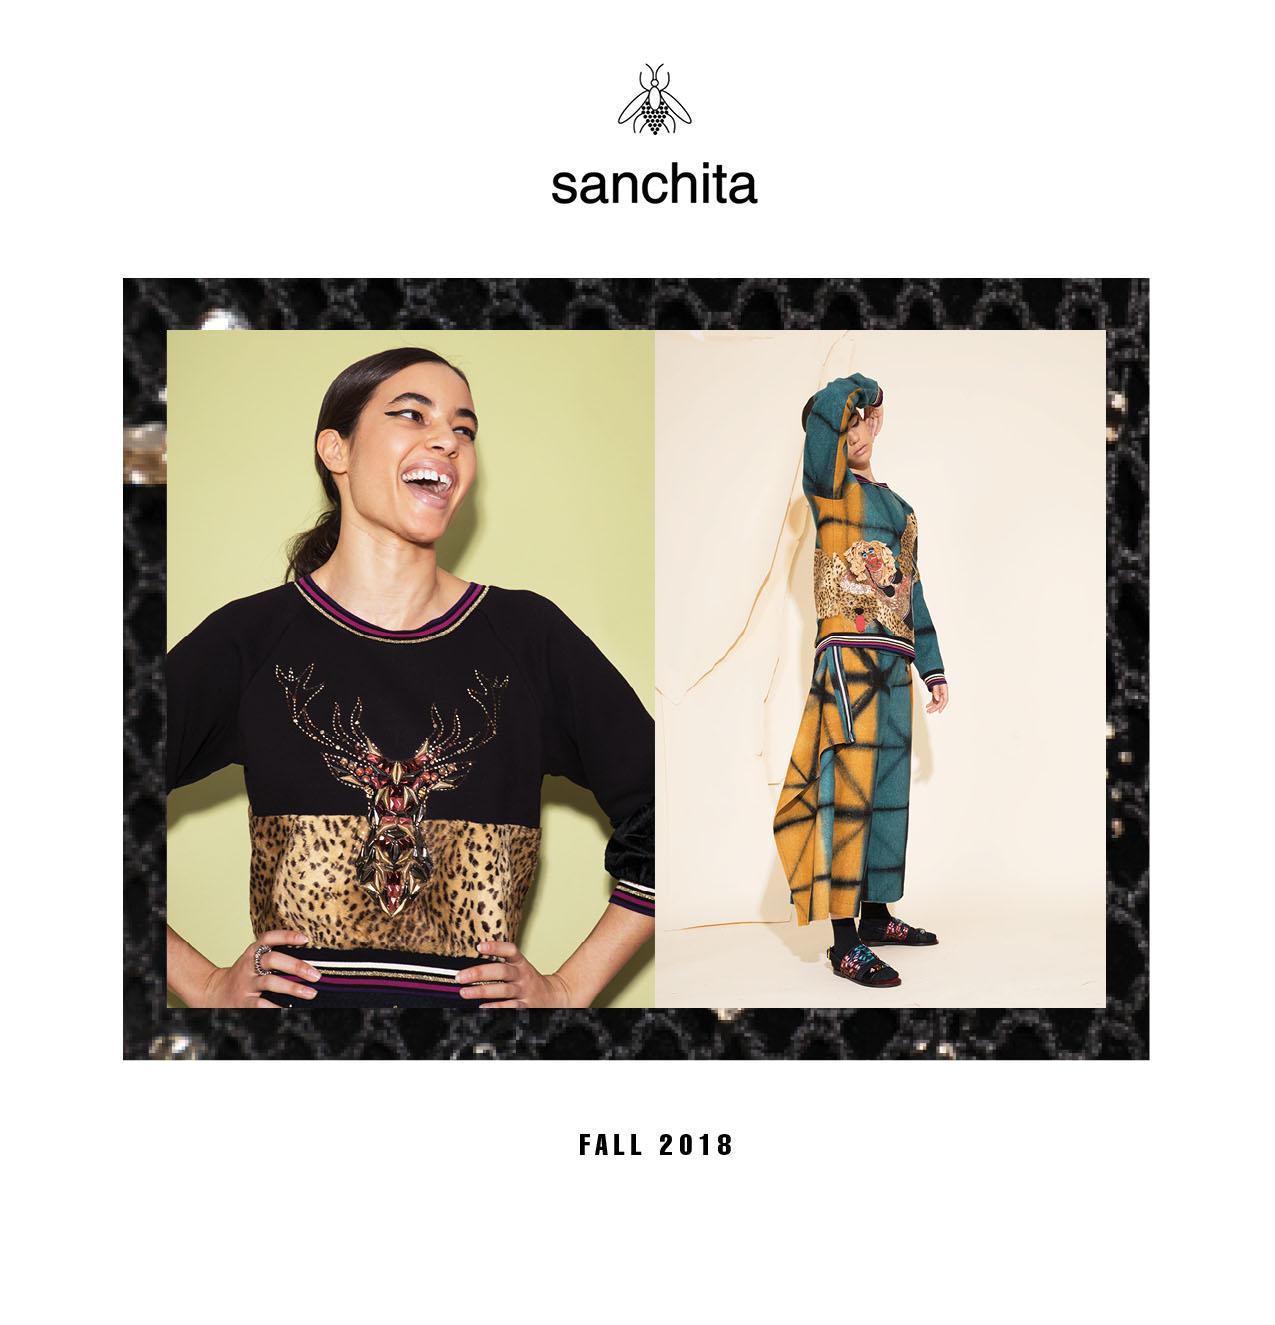 Sanchita_fall2018_white4.jpg